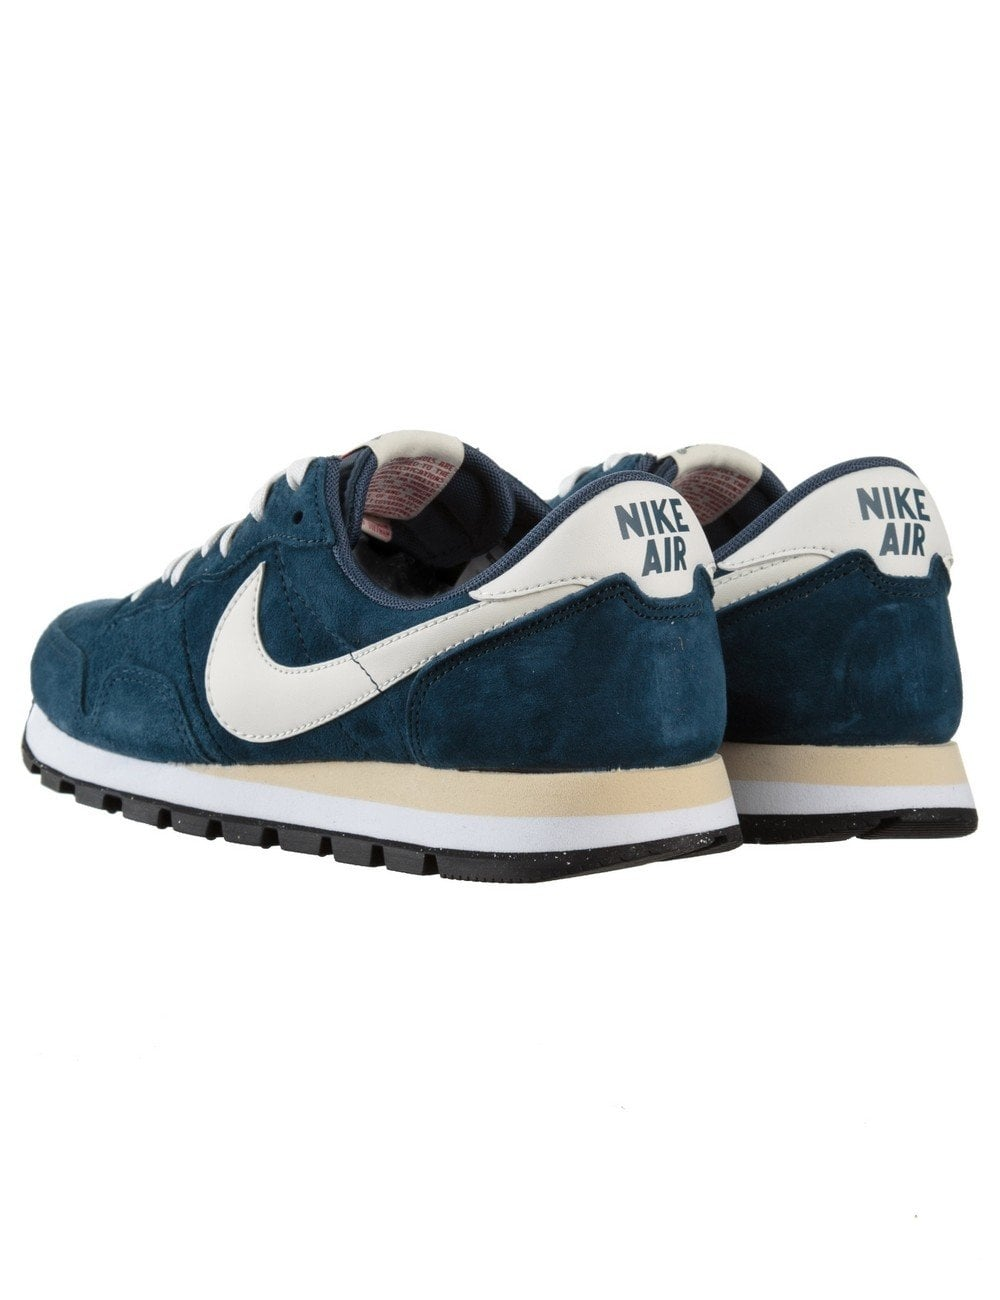 1b7e97fbf9bf9 Nike Air Pegasus 83 PGS LTR Shoes - Squadron Blue - Footwear from ...